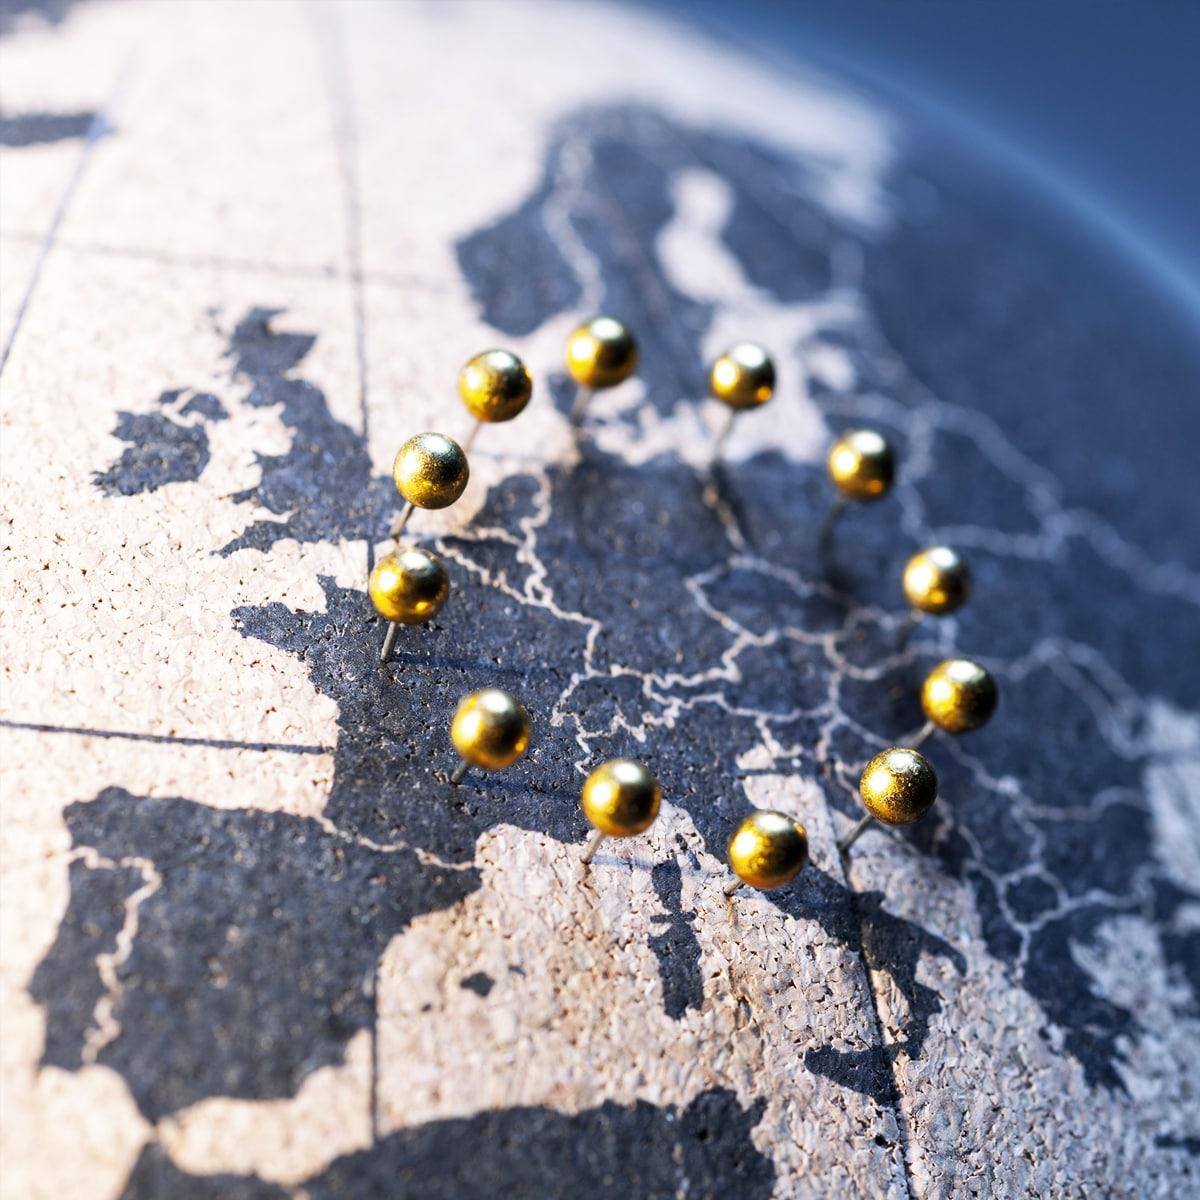 Occupazione Europa: i dati di novembre 2020